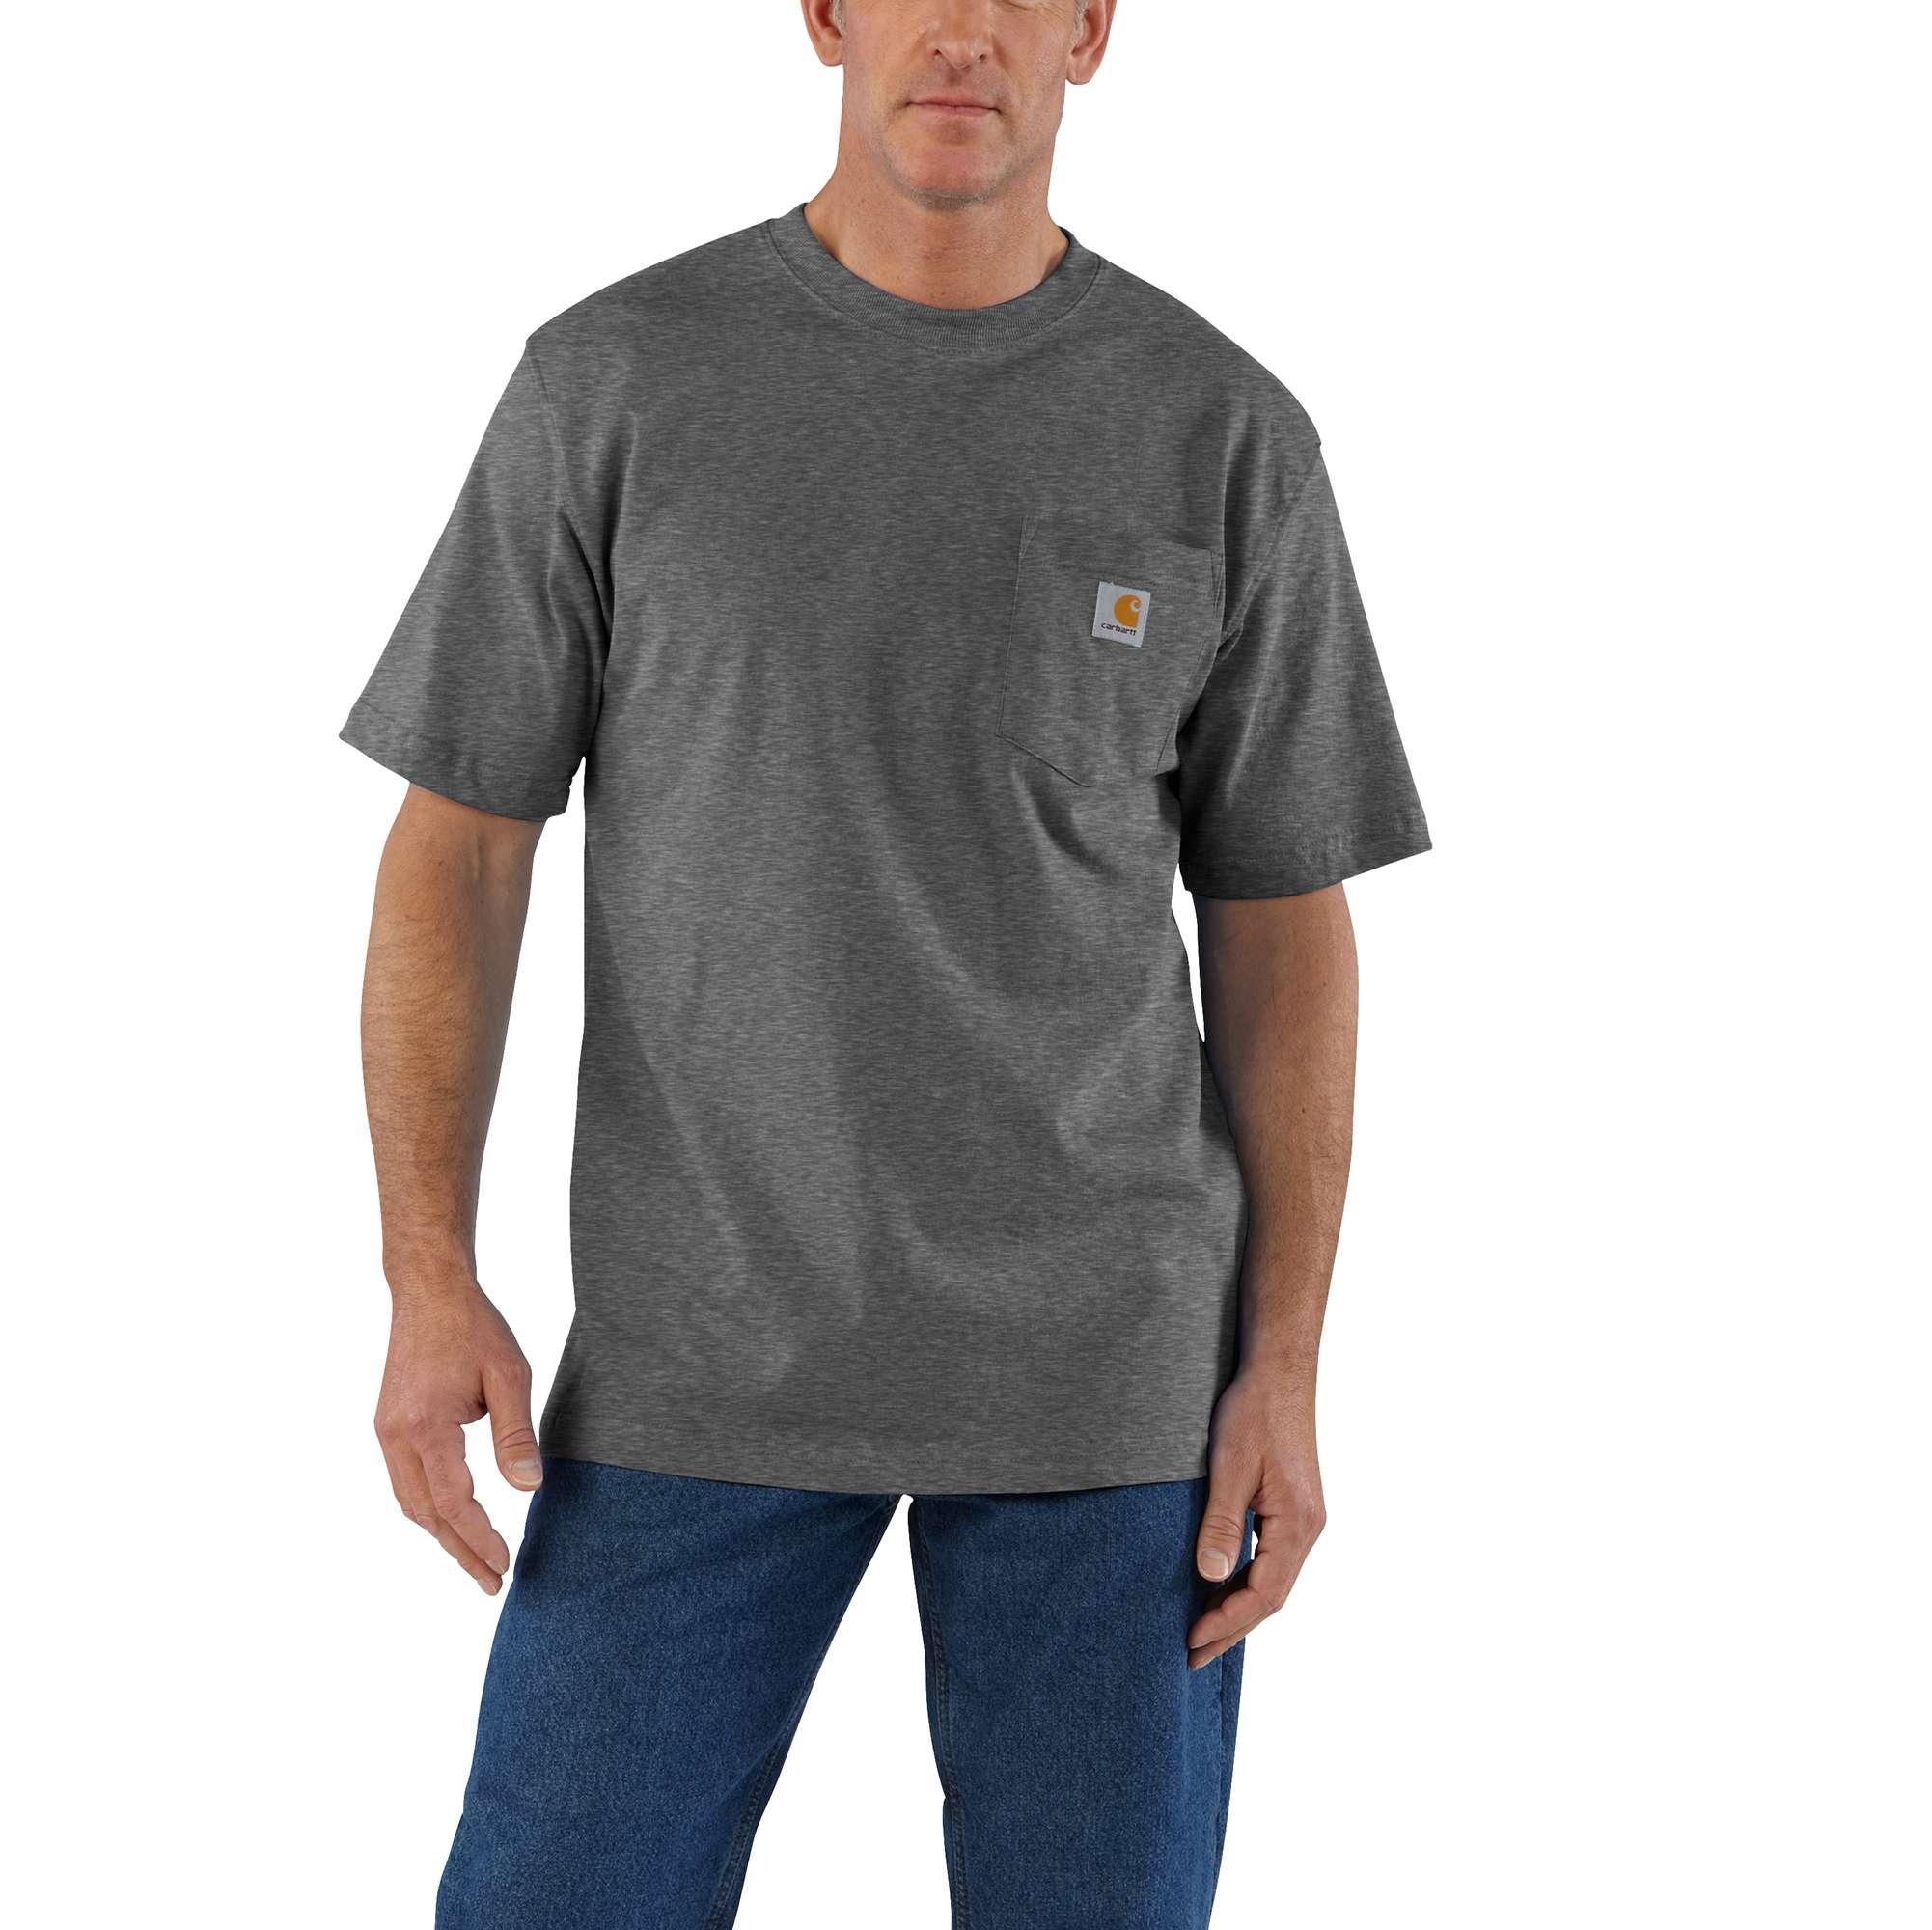 Men's Workwear Pocket T-Shirt, Gray, swatch